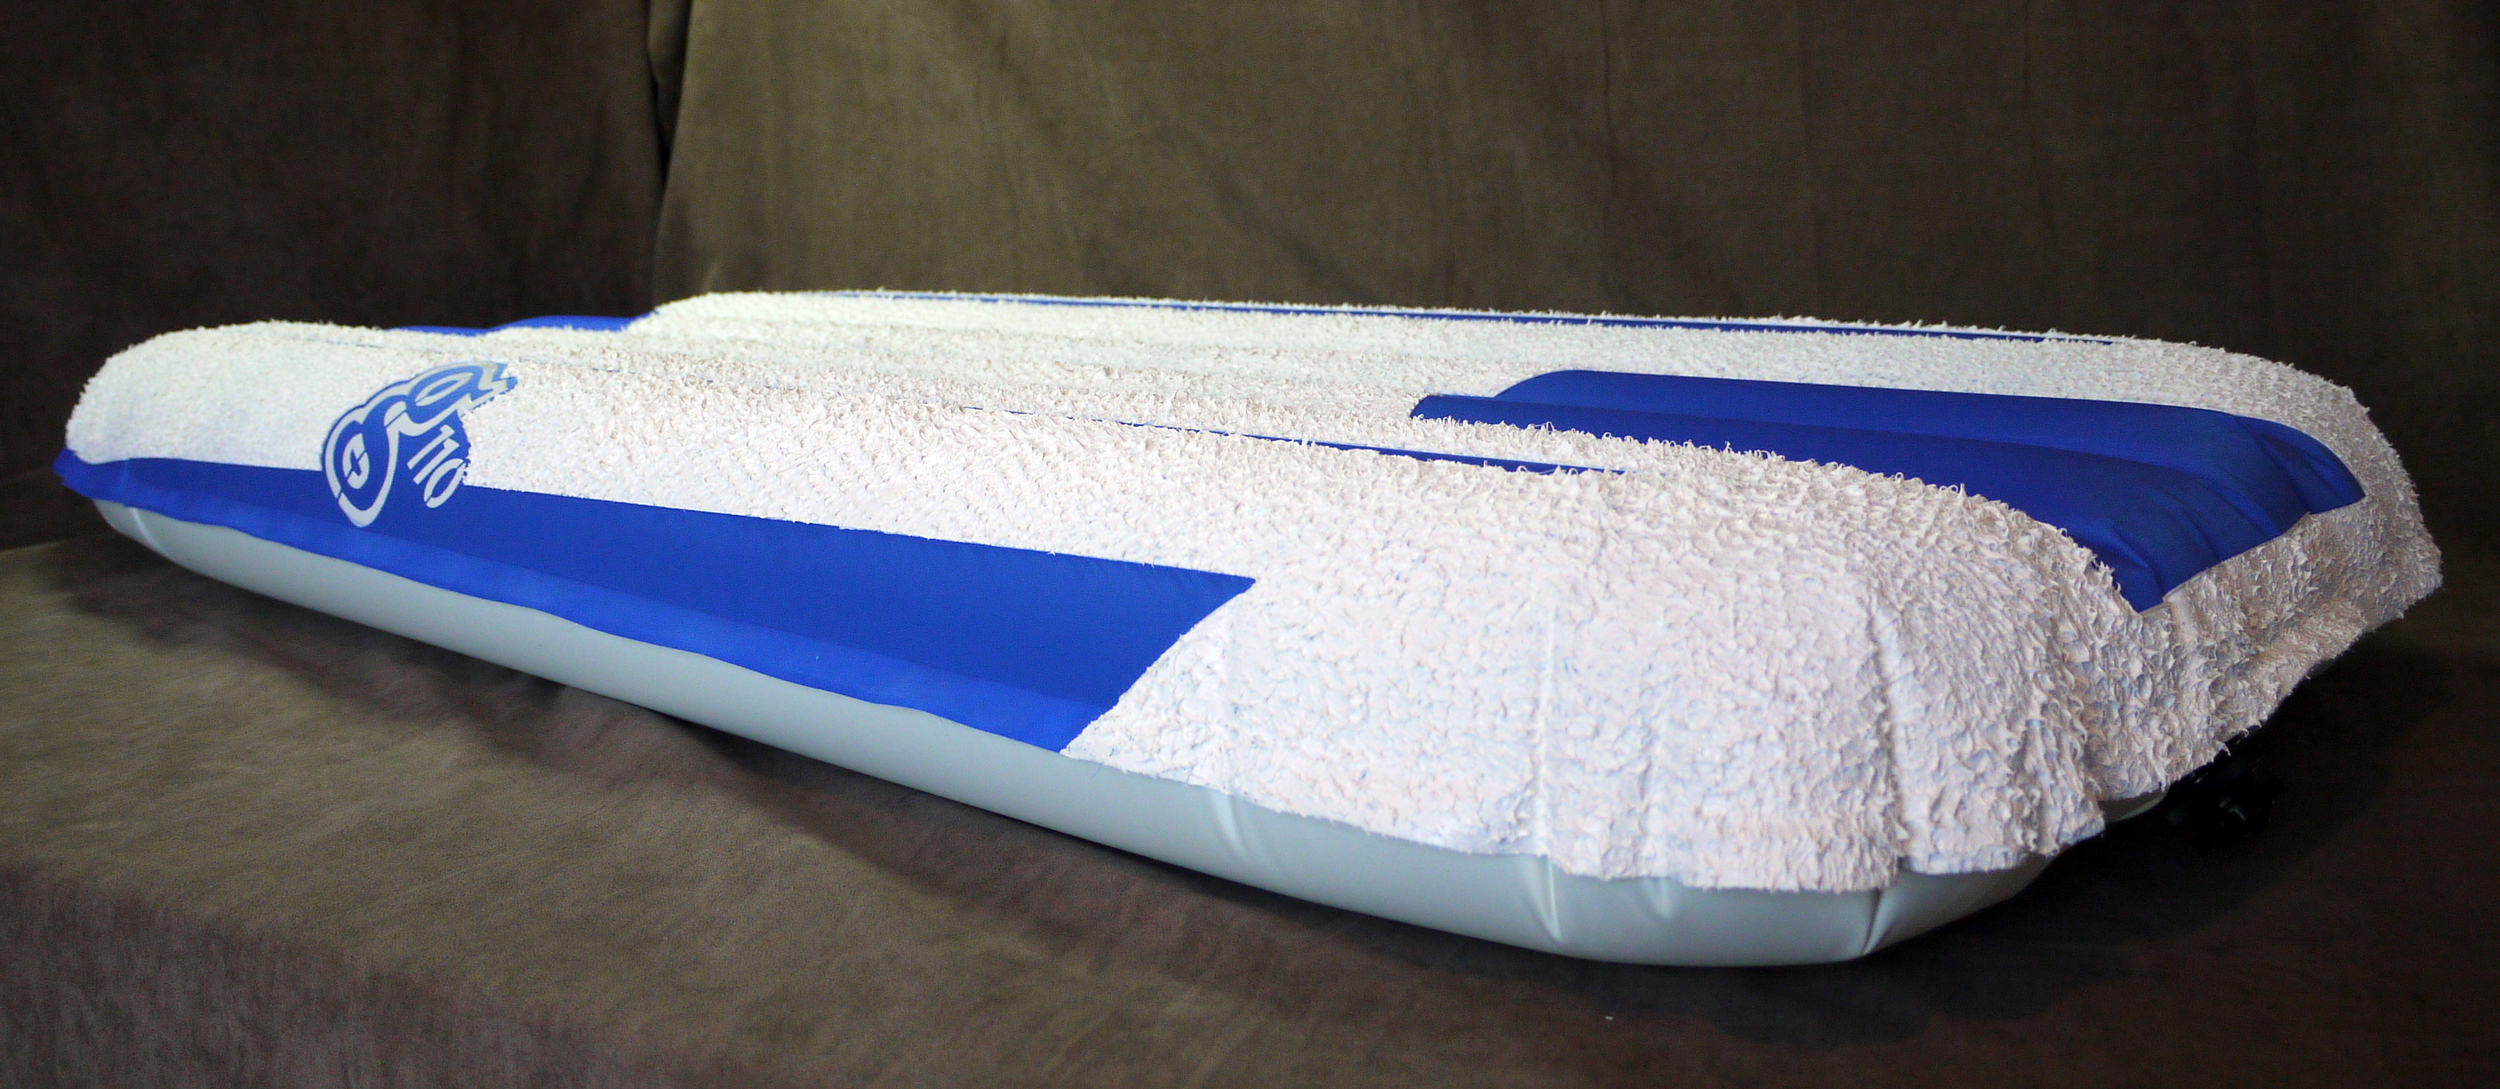 G-Mat 110 Surfmat Surf mat Nouveau Racer 1564